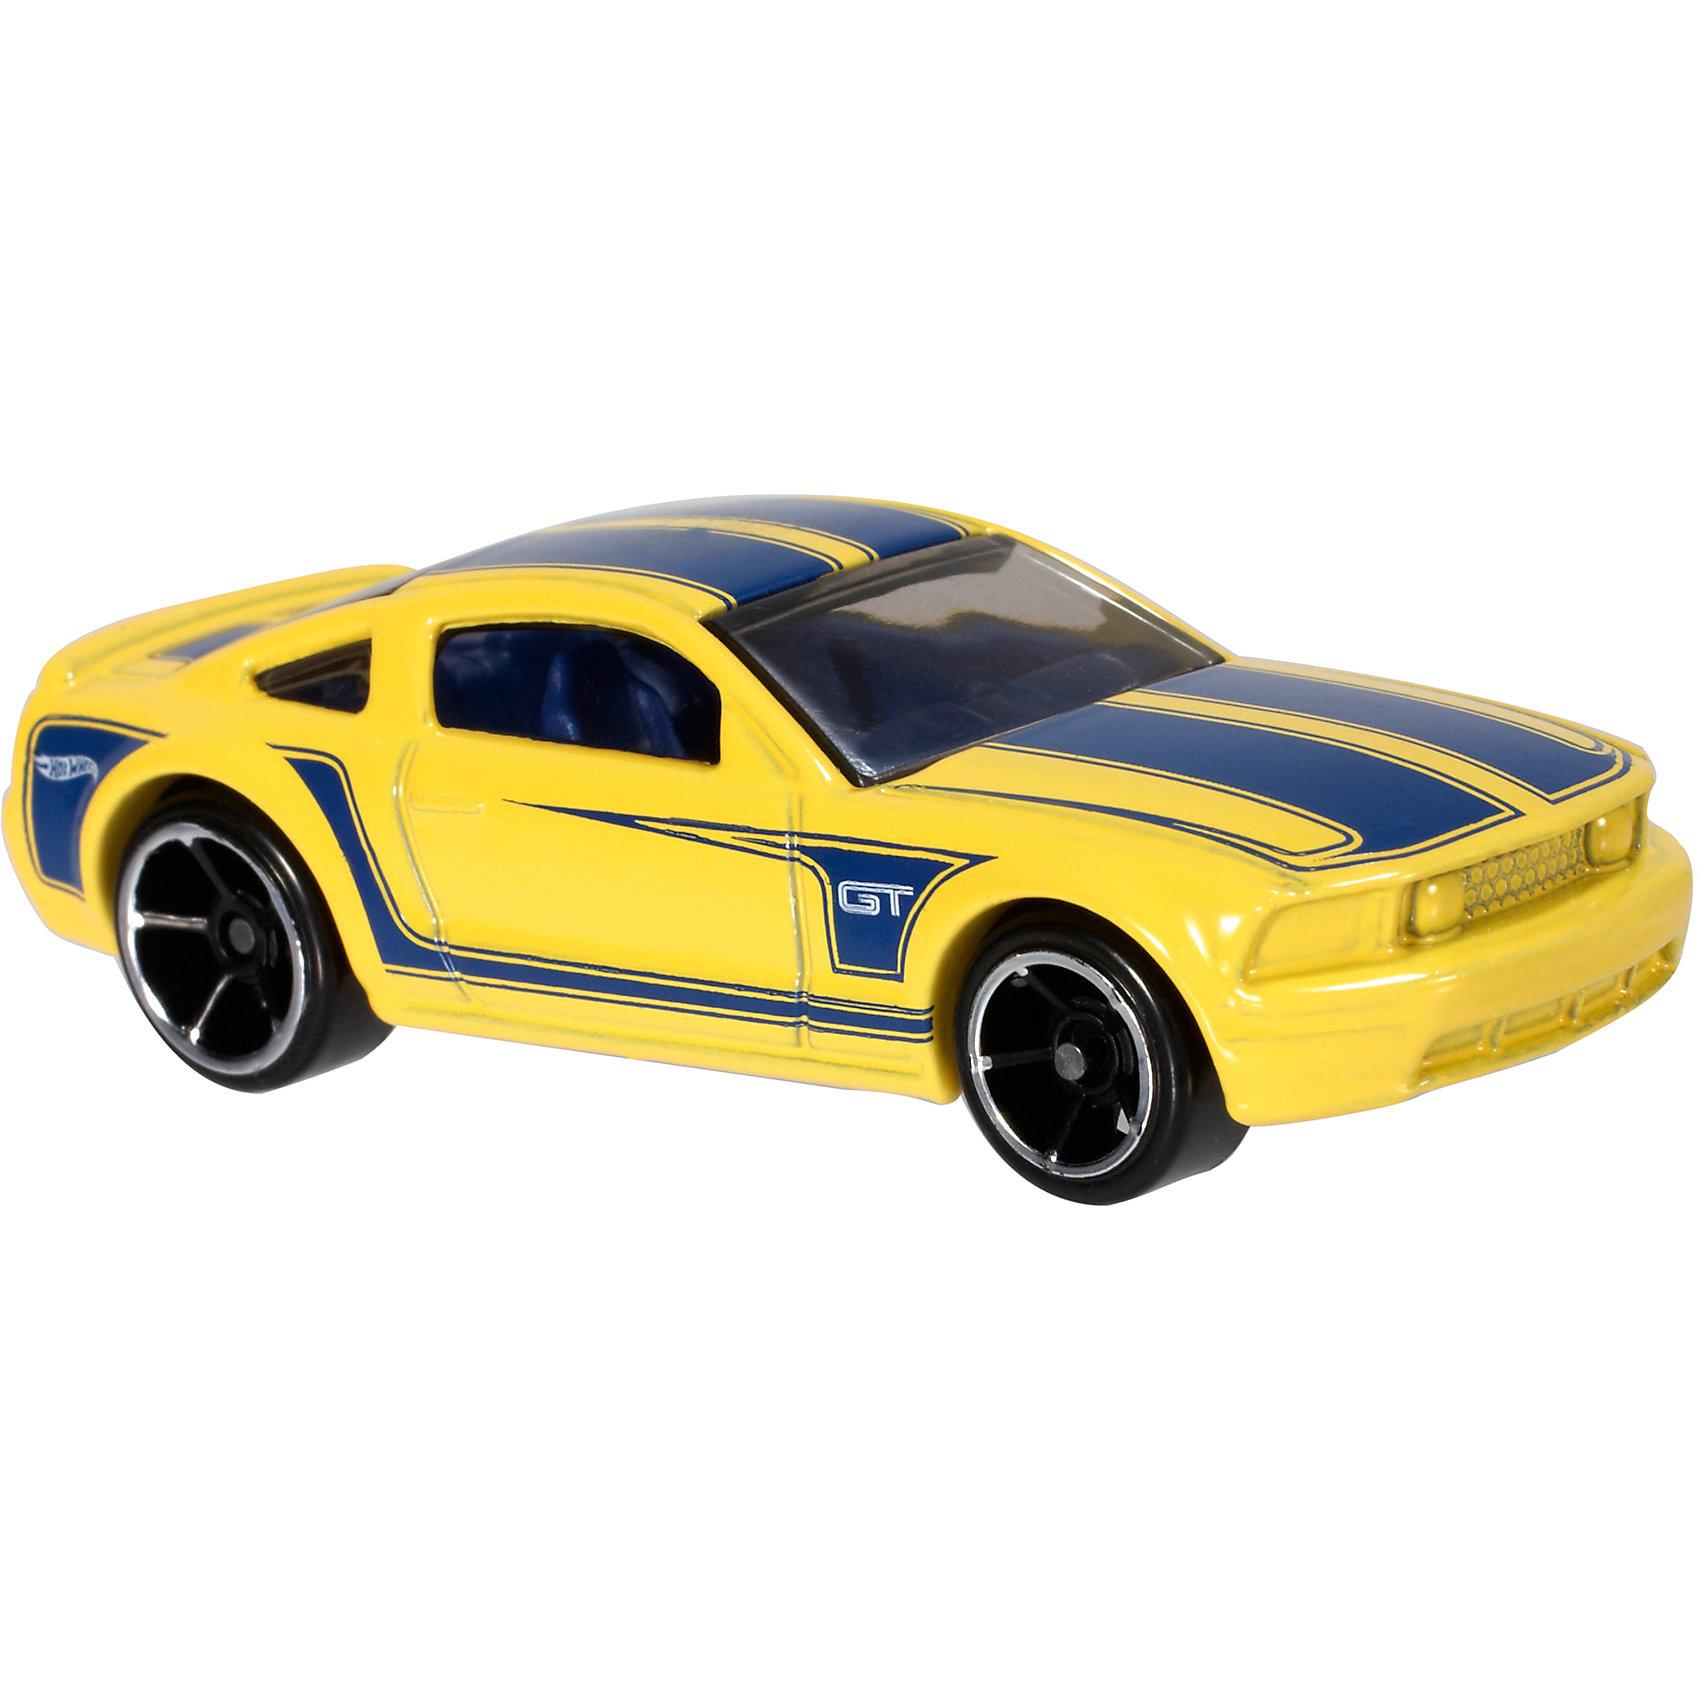 Базовая машинка Hot Wheels, 2005 Ford Mustang GTМашинки<br><br><br>Ширина мм: 110<br>Глубина мм: 45<br>Высота мм: 110<br>Вес г: 30<br>Возраст от месяцев: 36<br>Возраст до месяцев: 96<br>Пол: Мужской<br>Возраст: Детский<br>SKU: 7111913